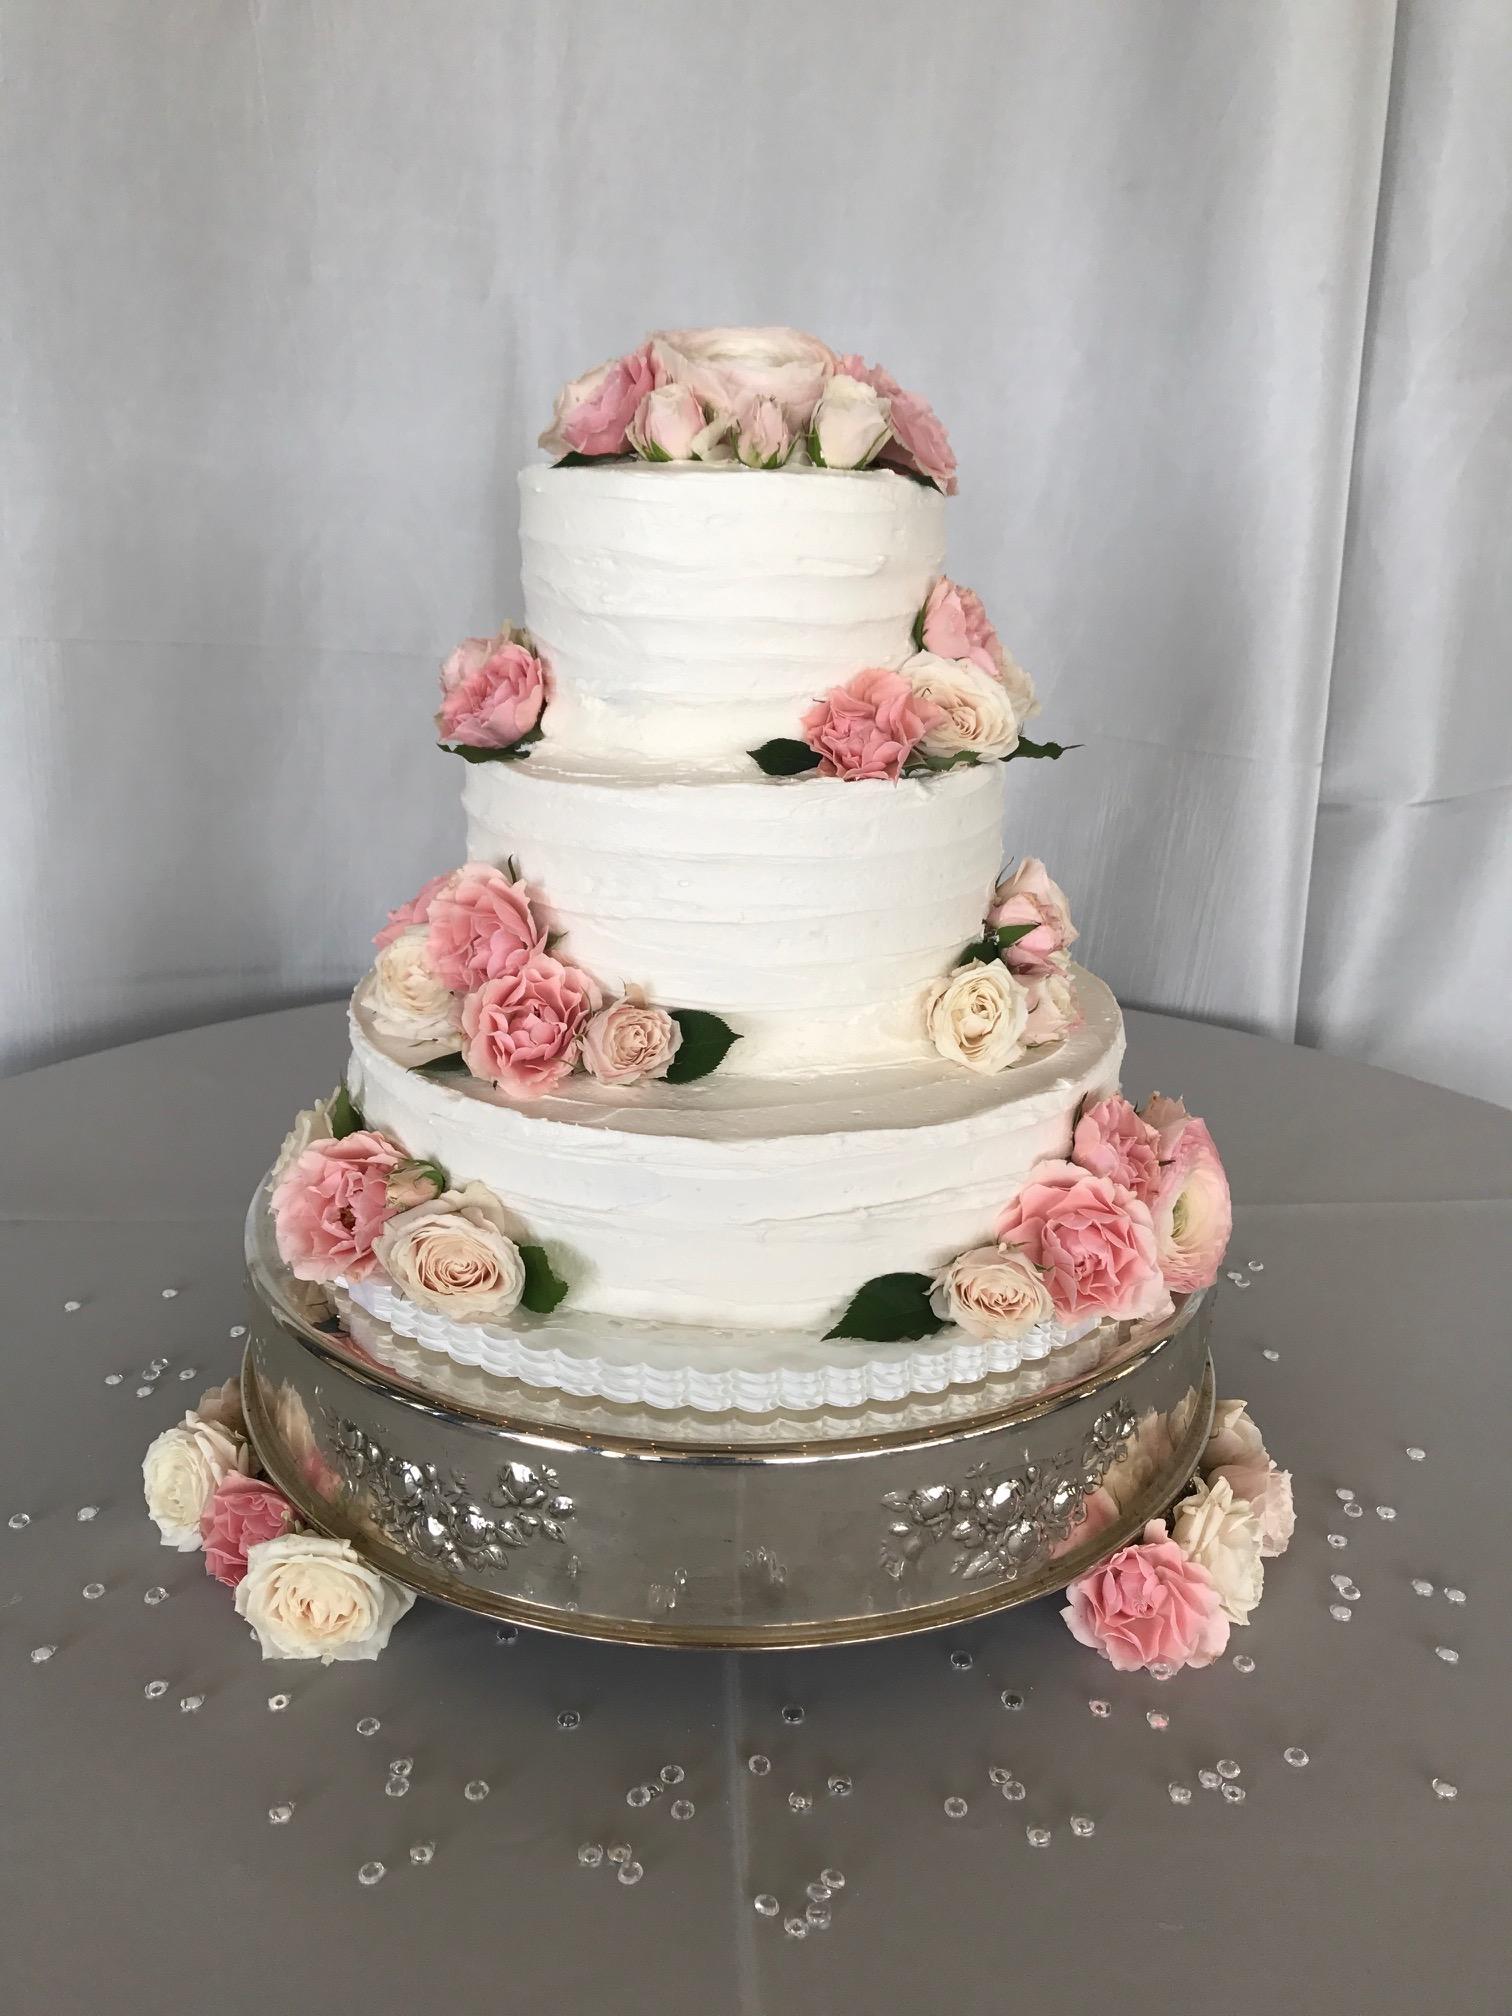 3 tier rustic sides pale pink and ivory random flowers.jpg